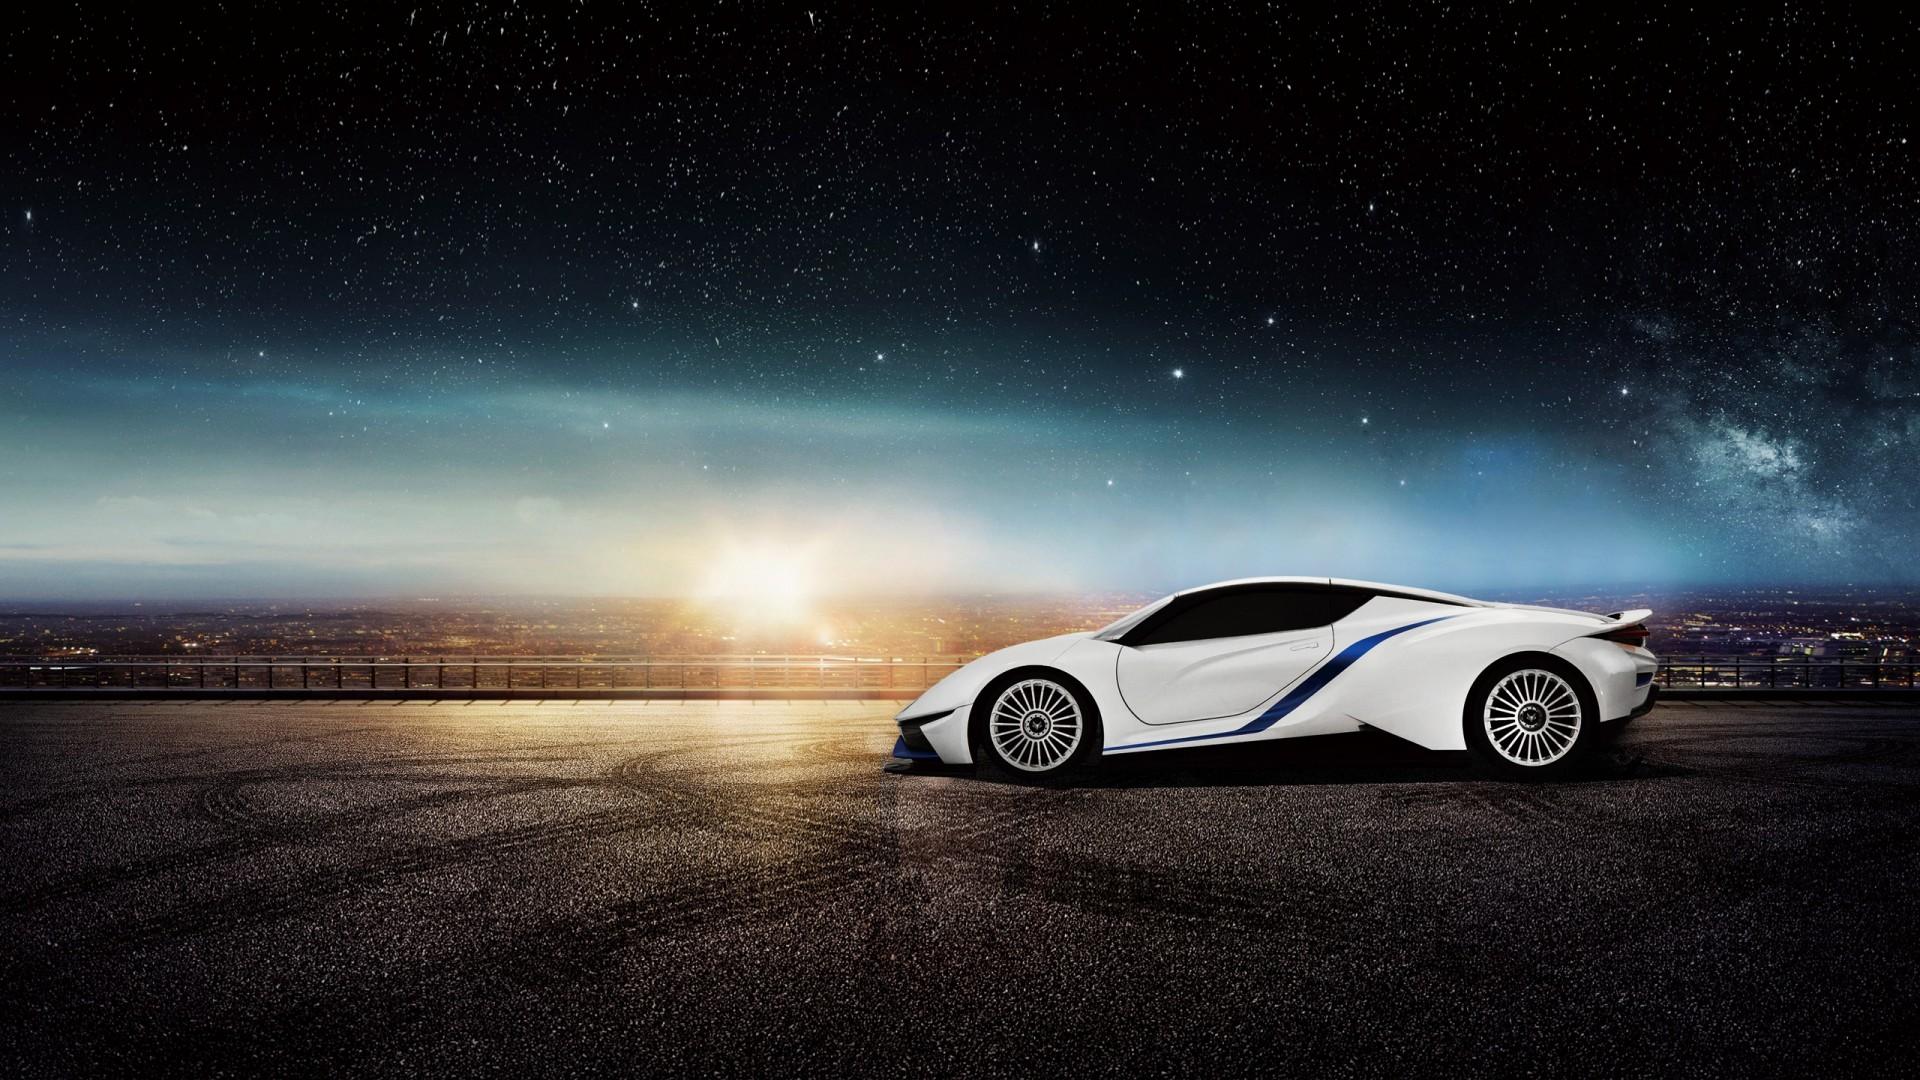 Baic Arcfox 7 Electric Supercar Wallpaper